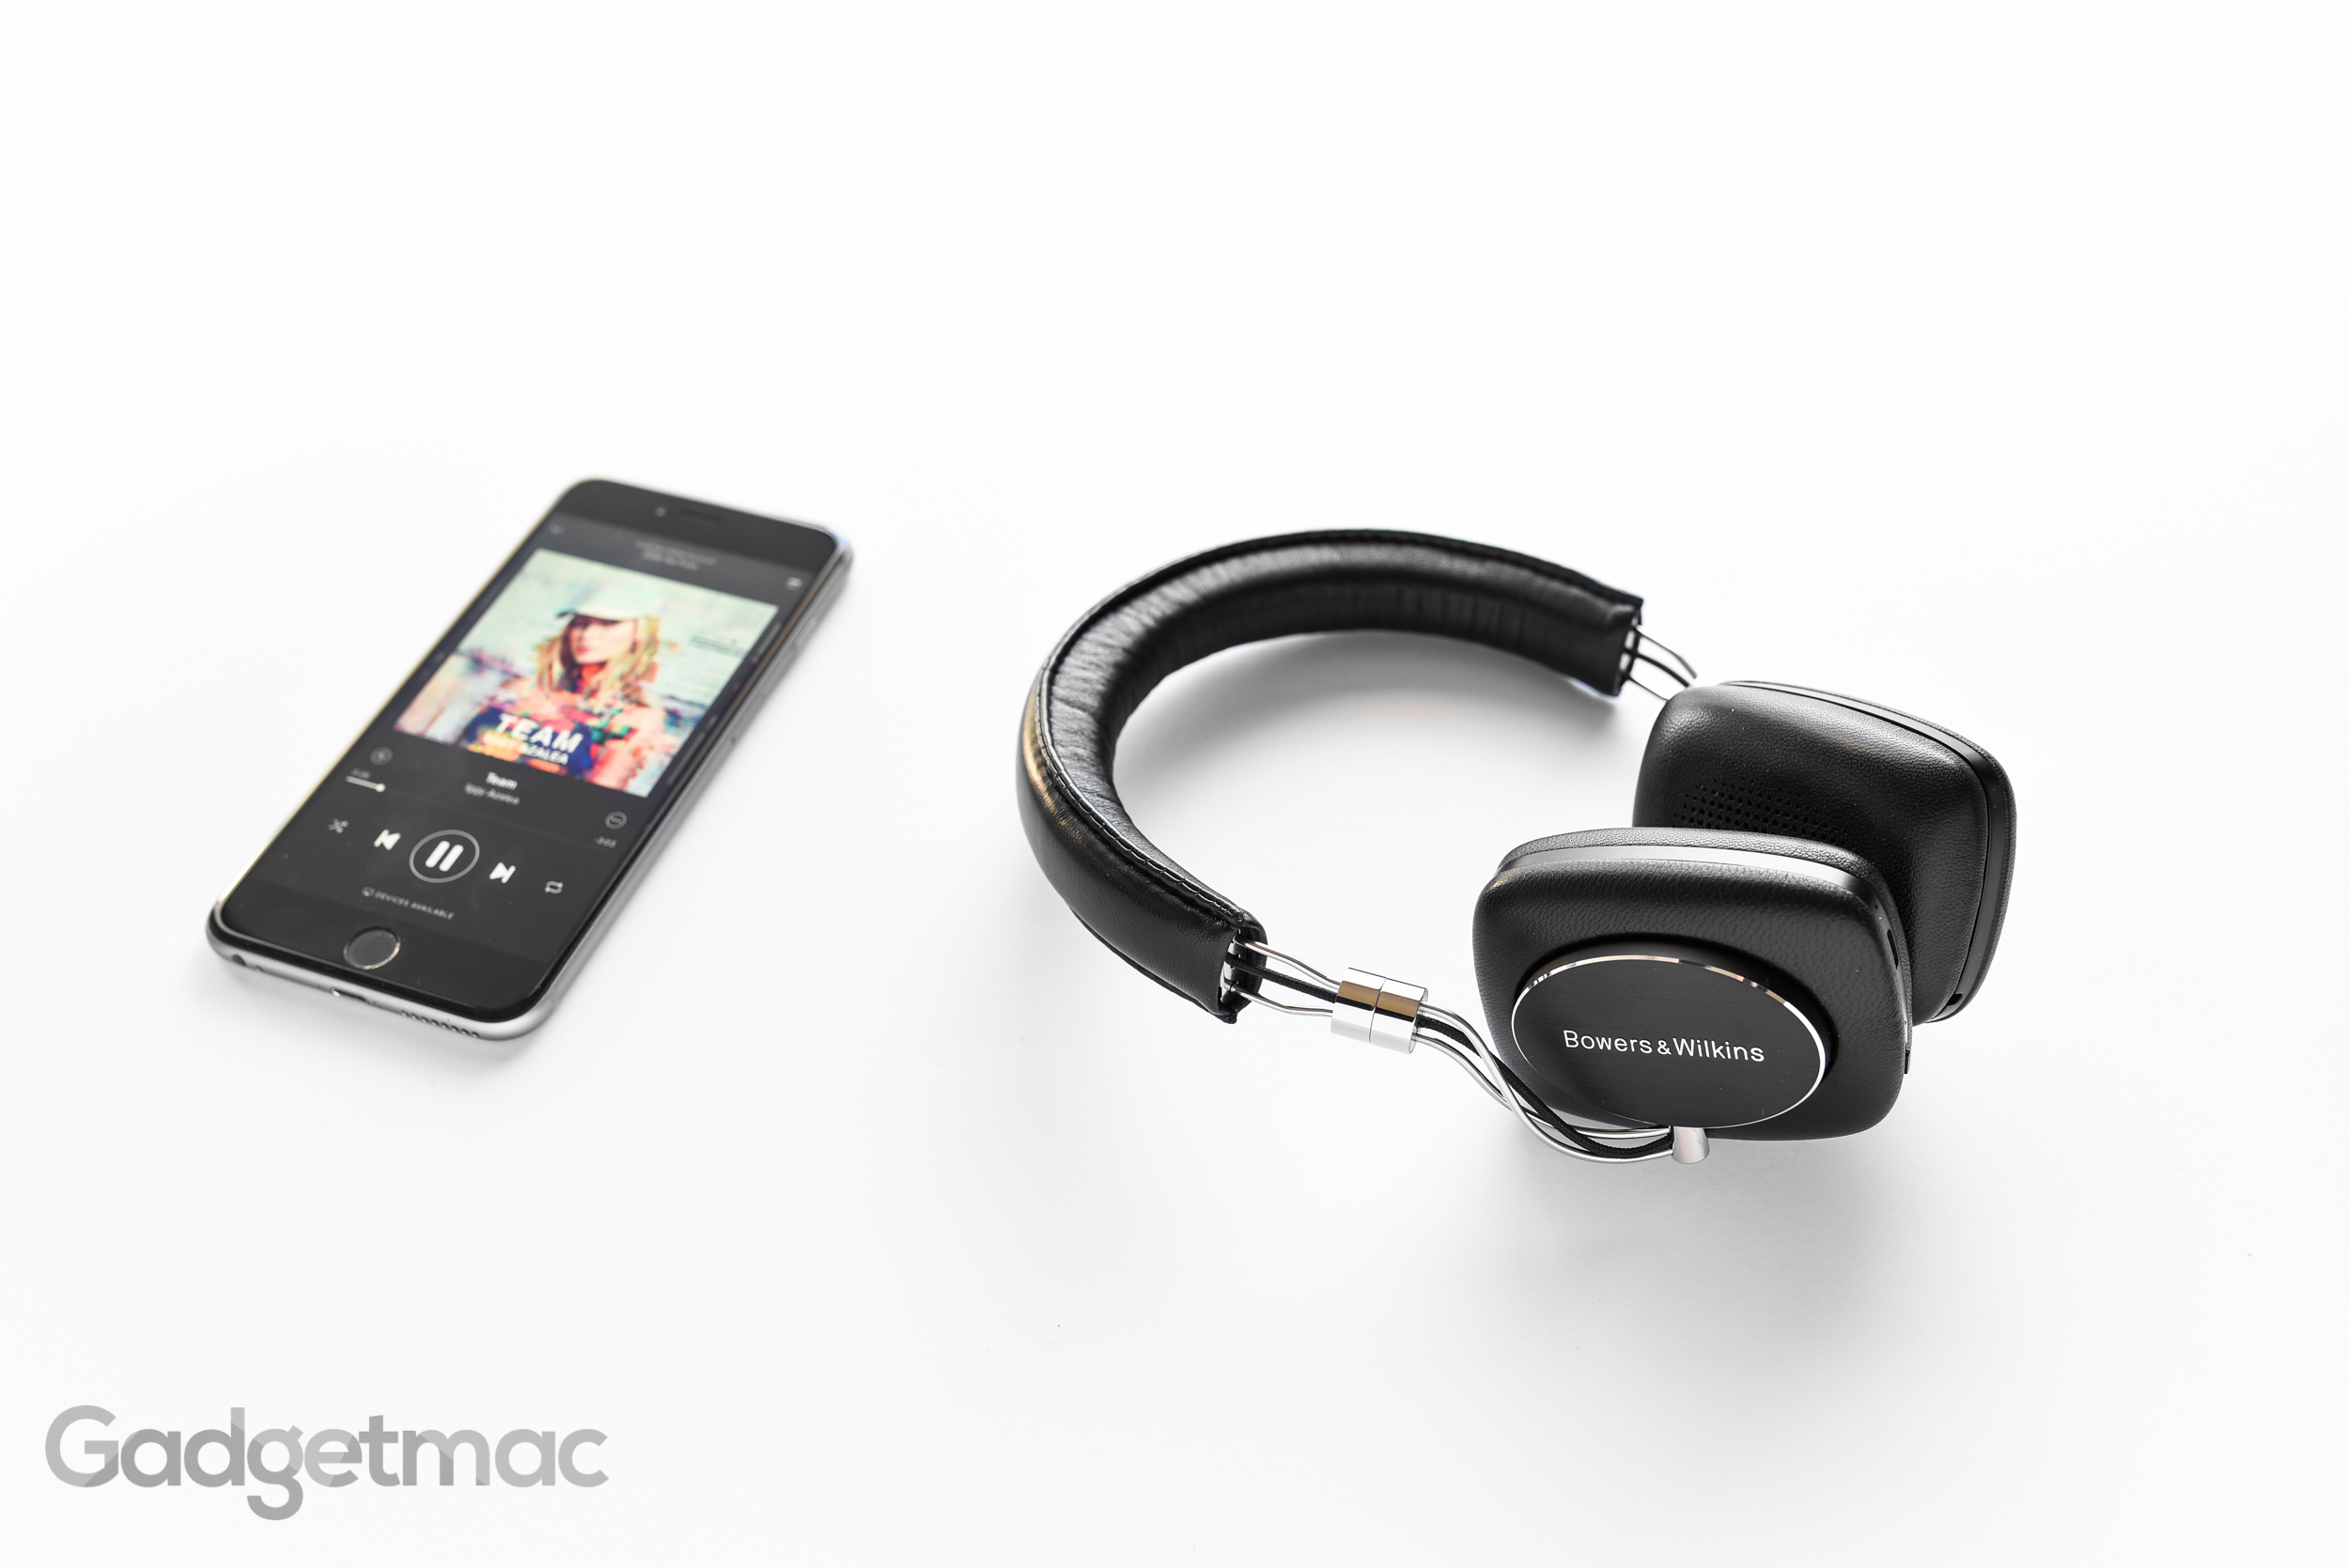 bowers-wilkins-p5-wireless-bluetooth-headphones.jpg